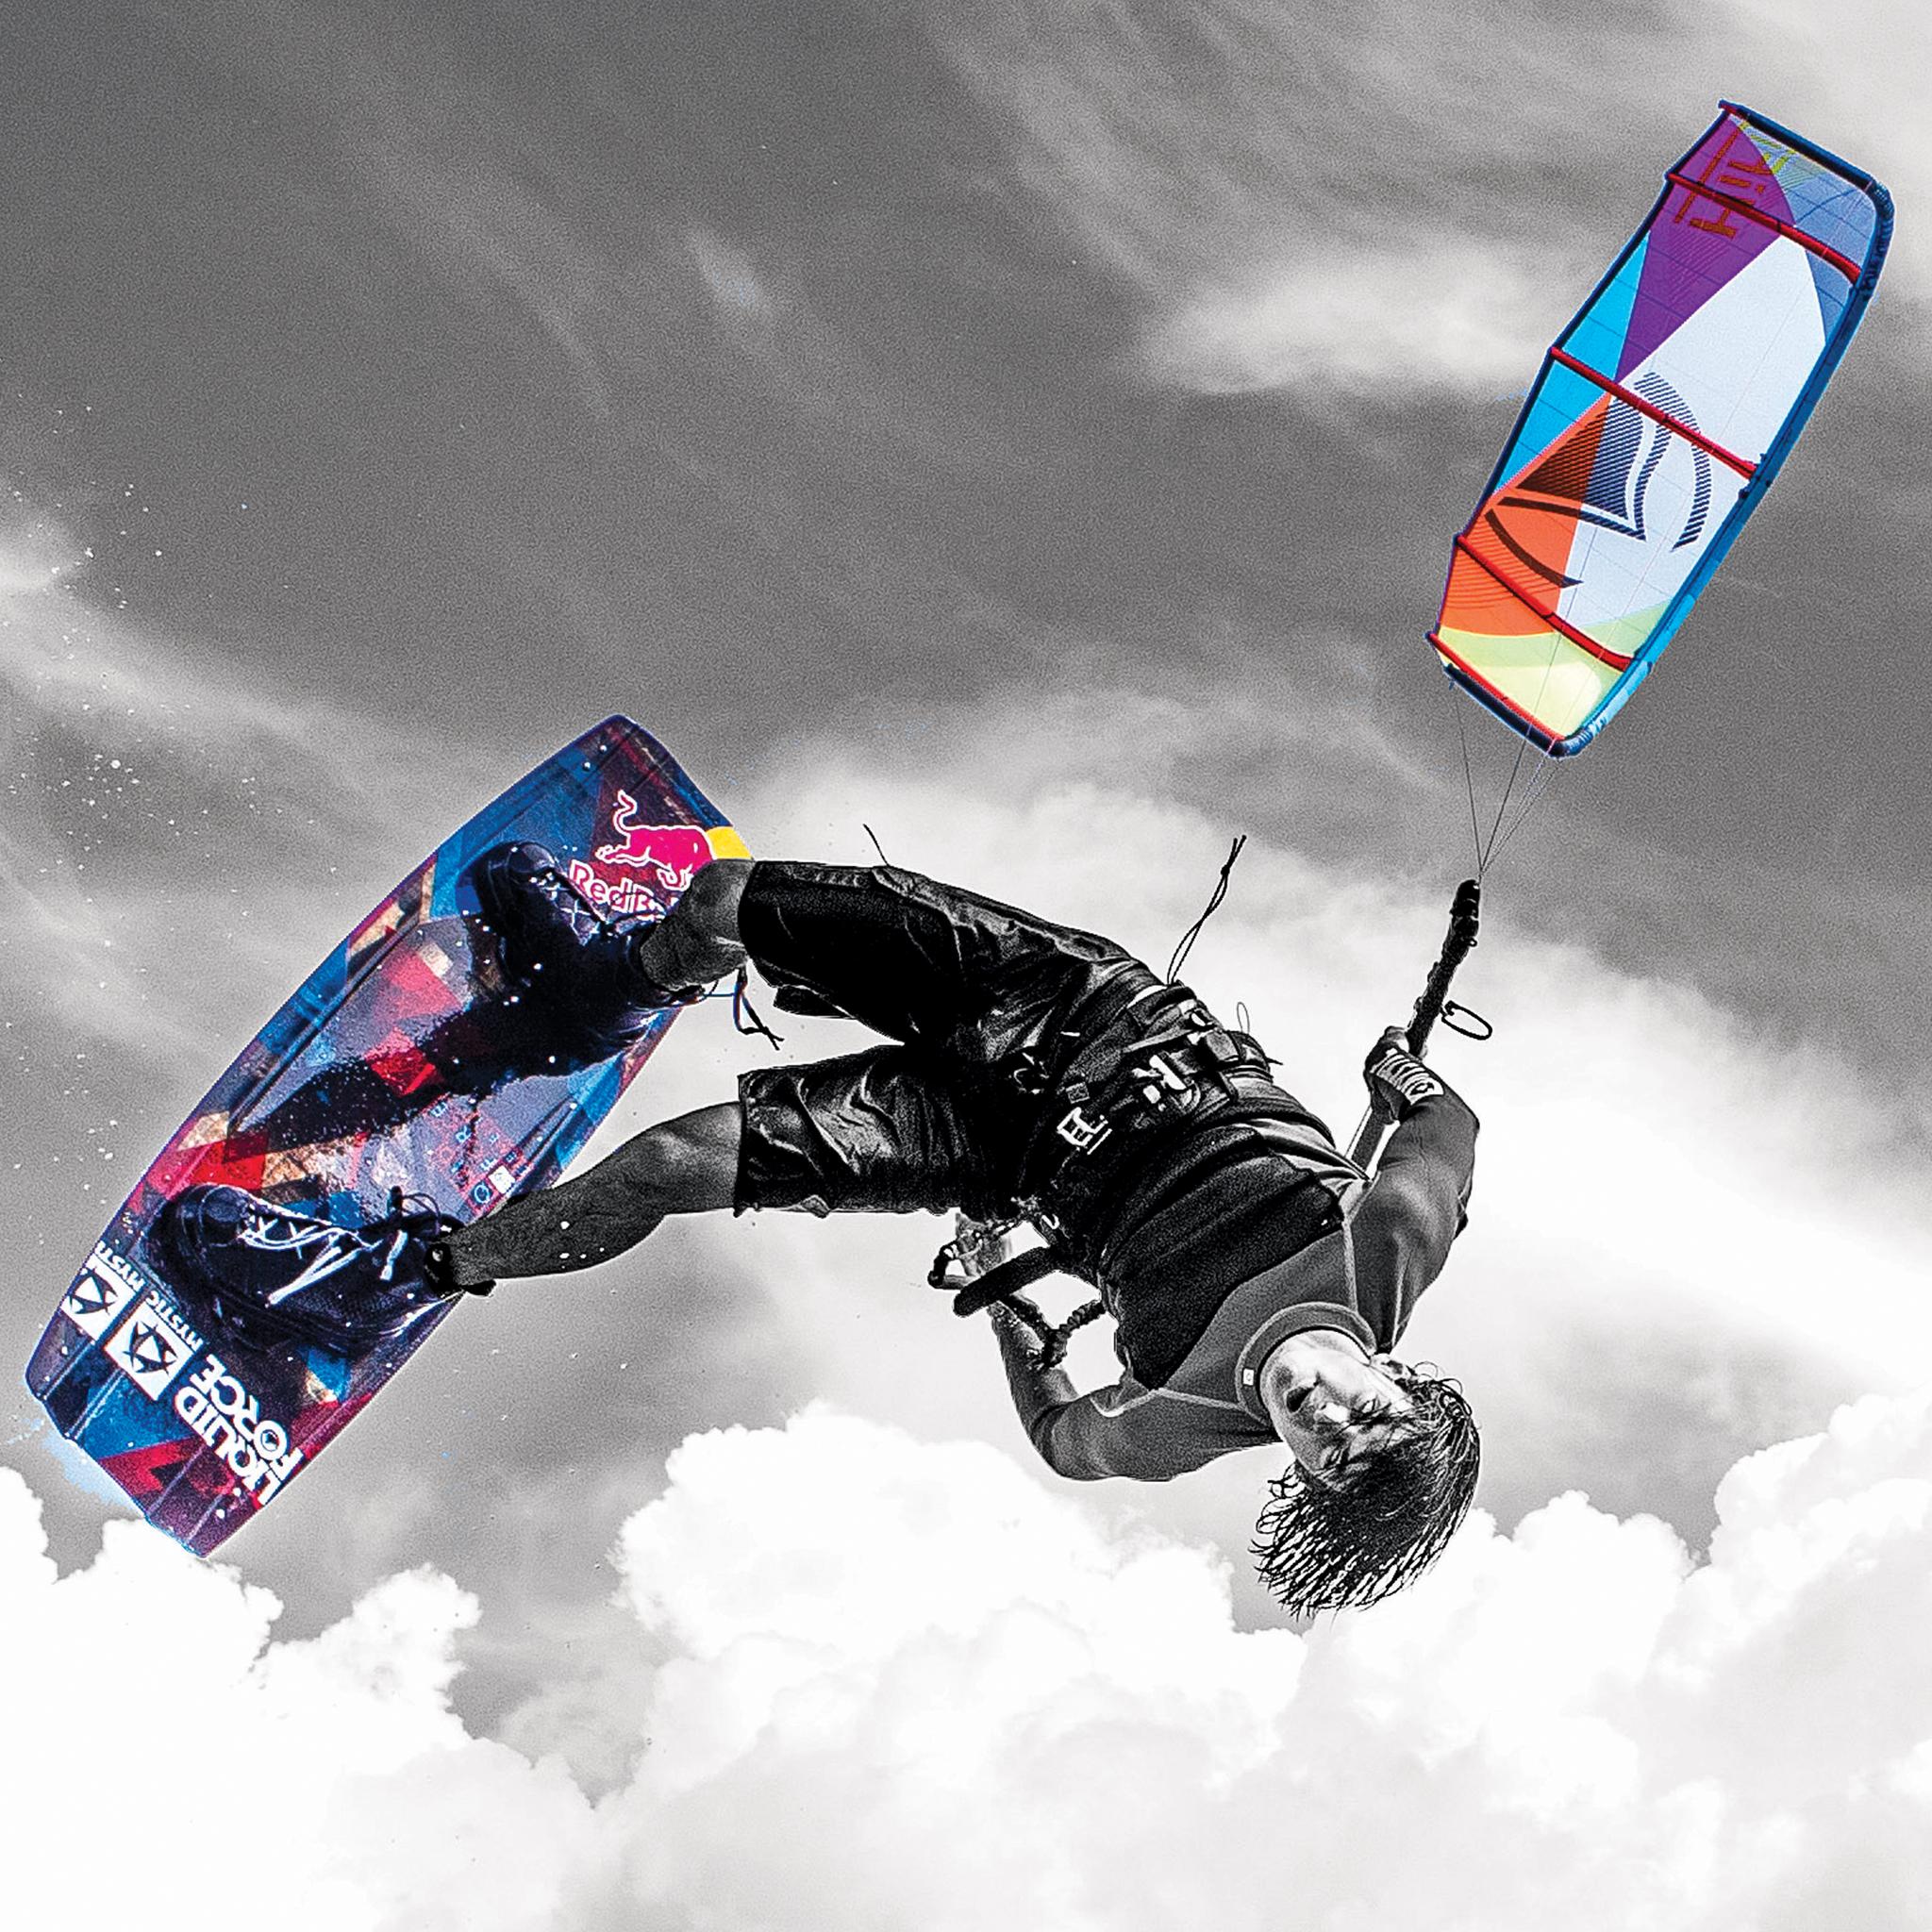 Download Wake style kiteboarding wallpaper Cristophe Tack 2048x2048